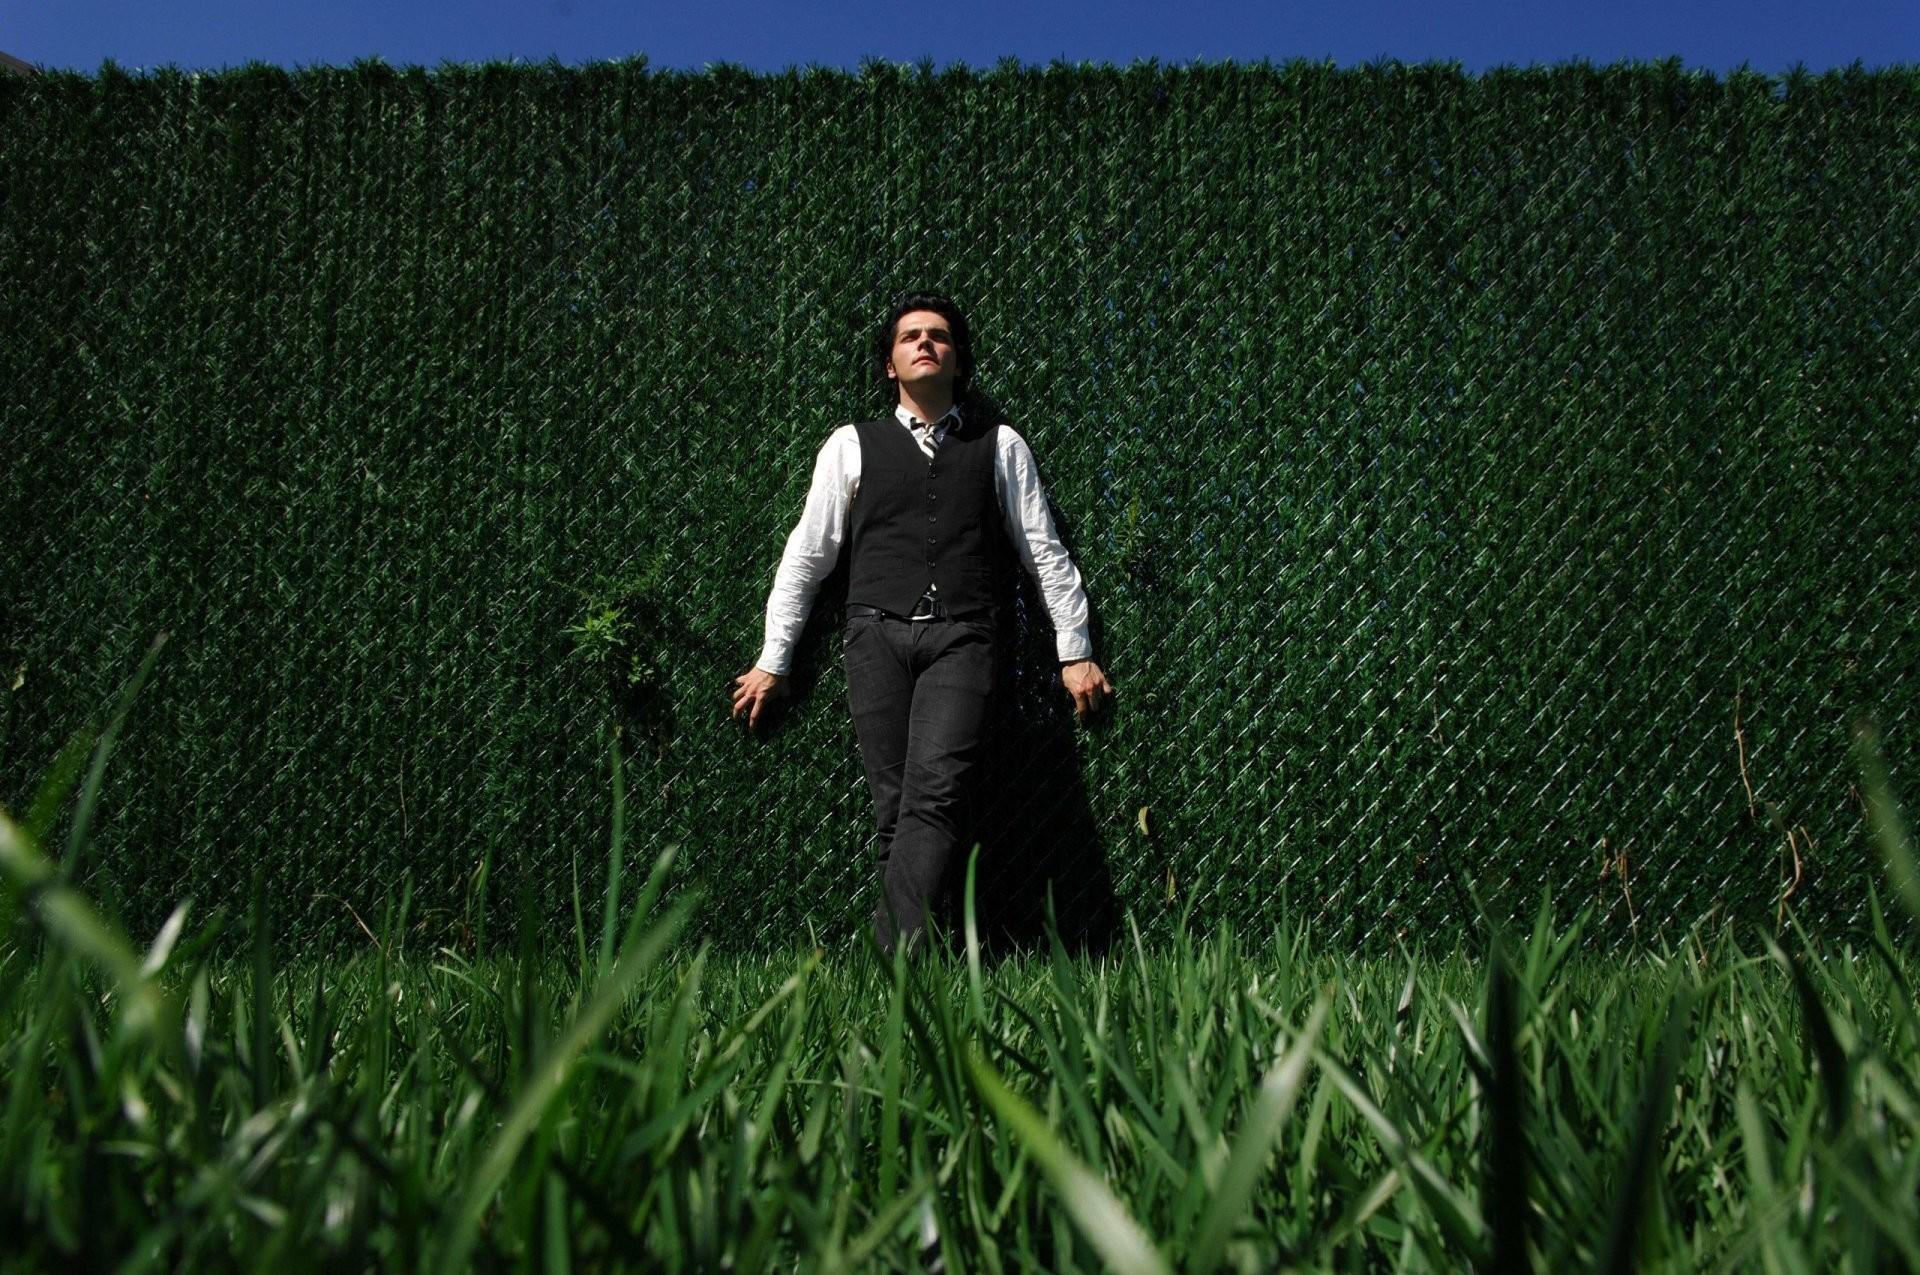 my chemical romance gerard way gerard way grass green wall